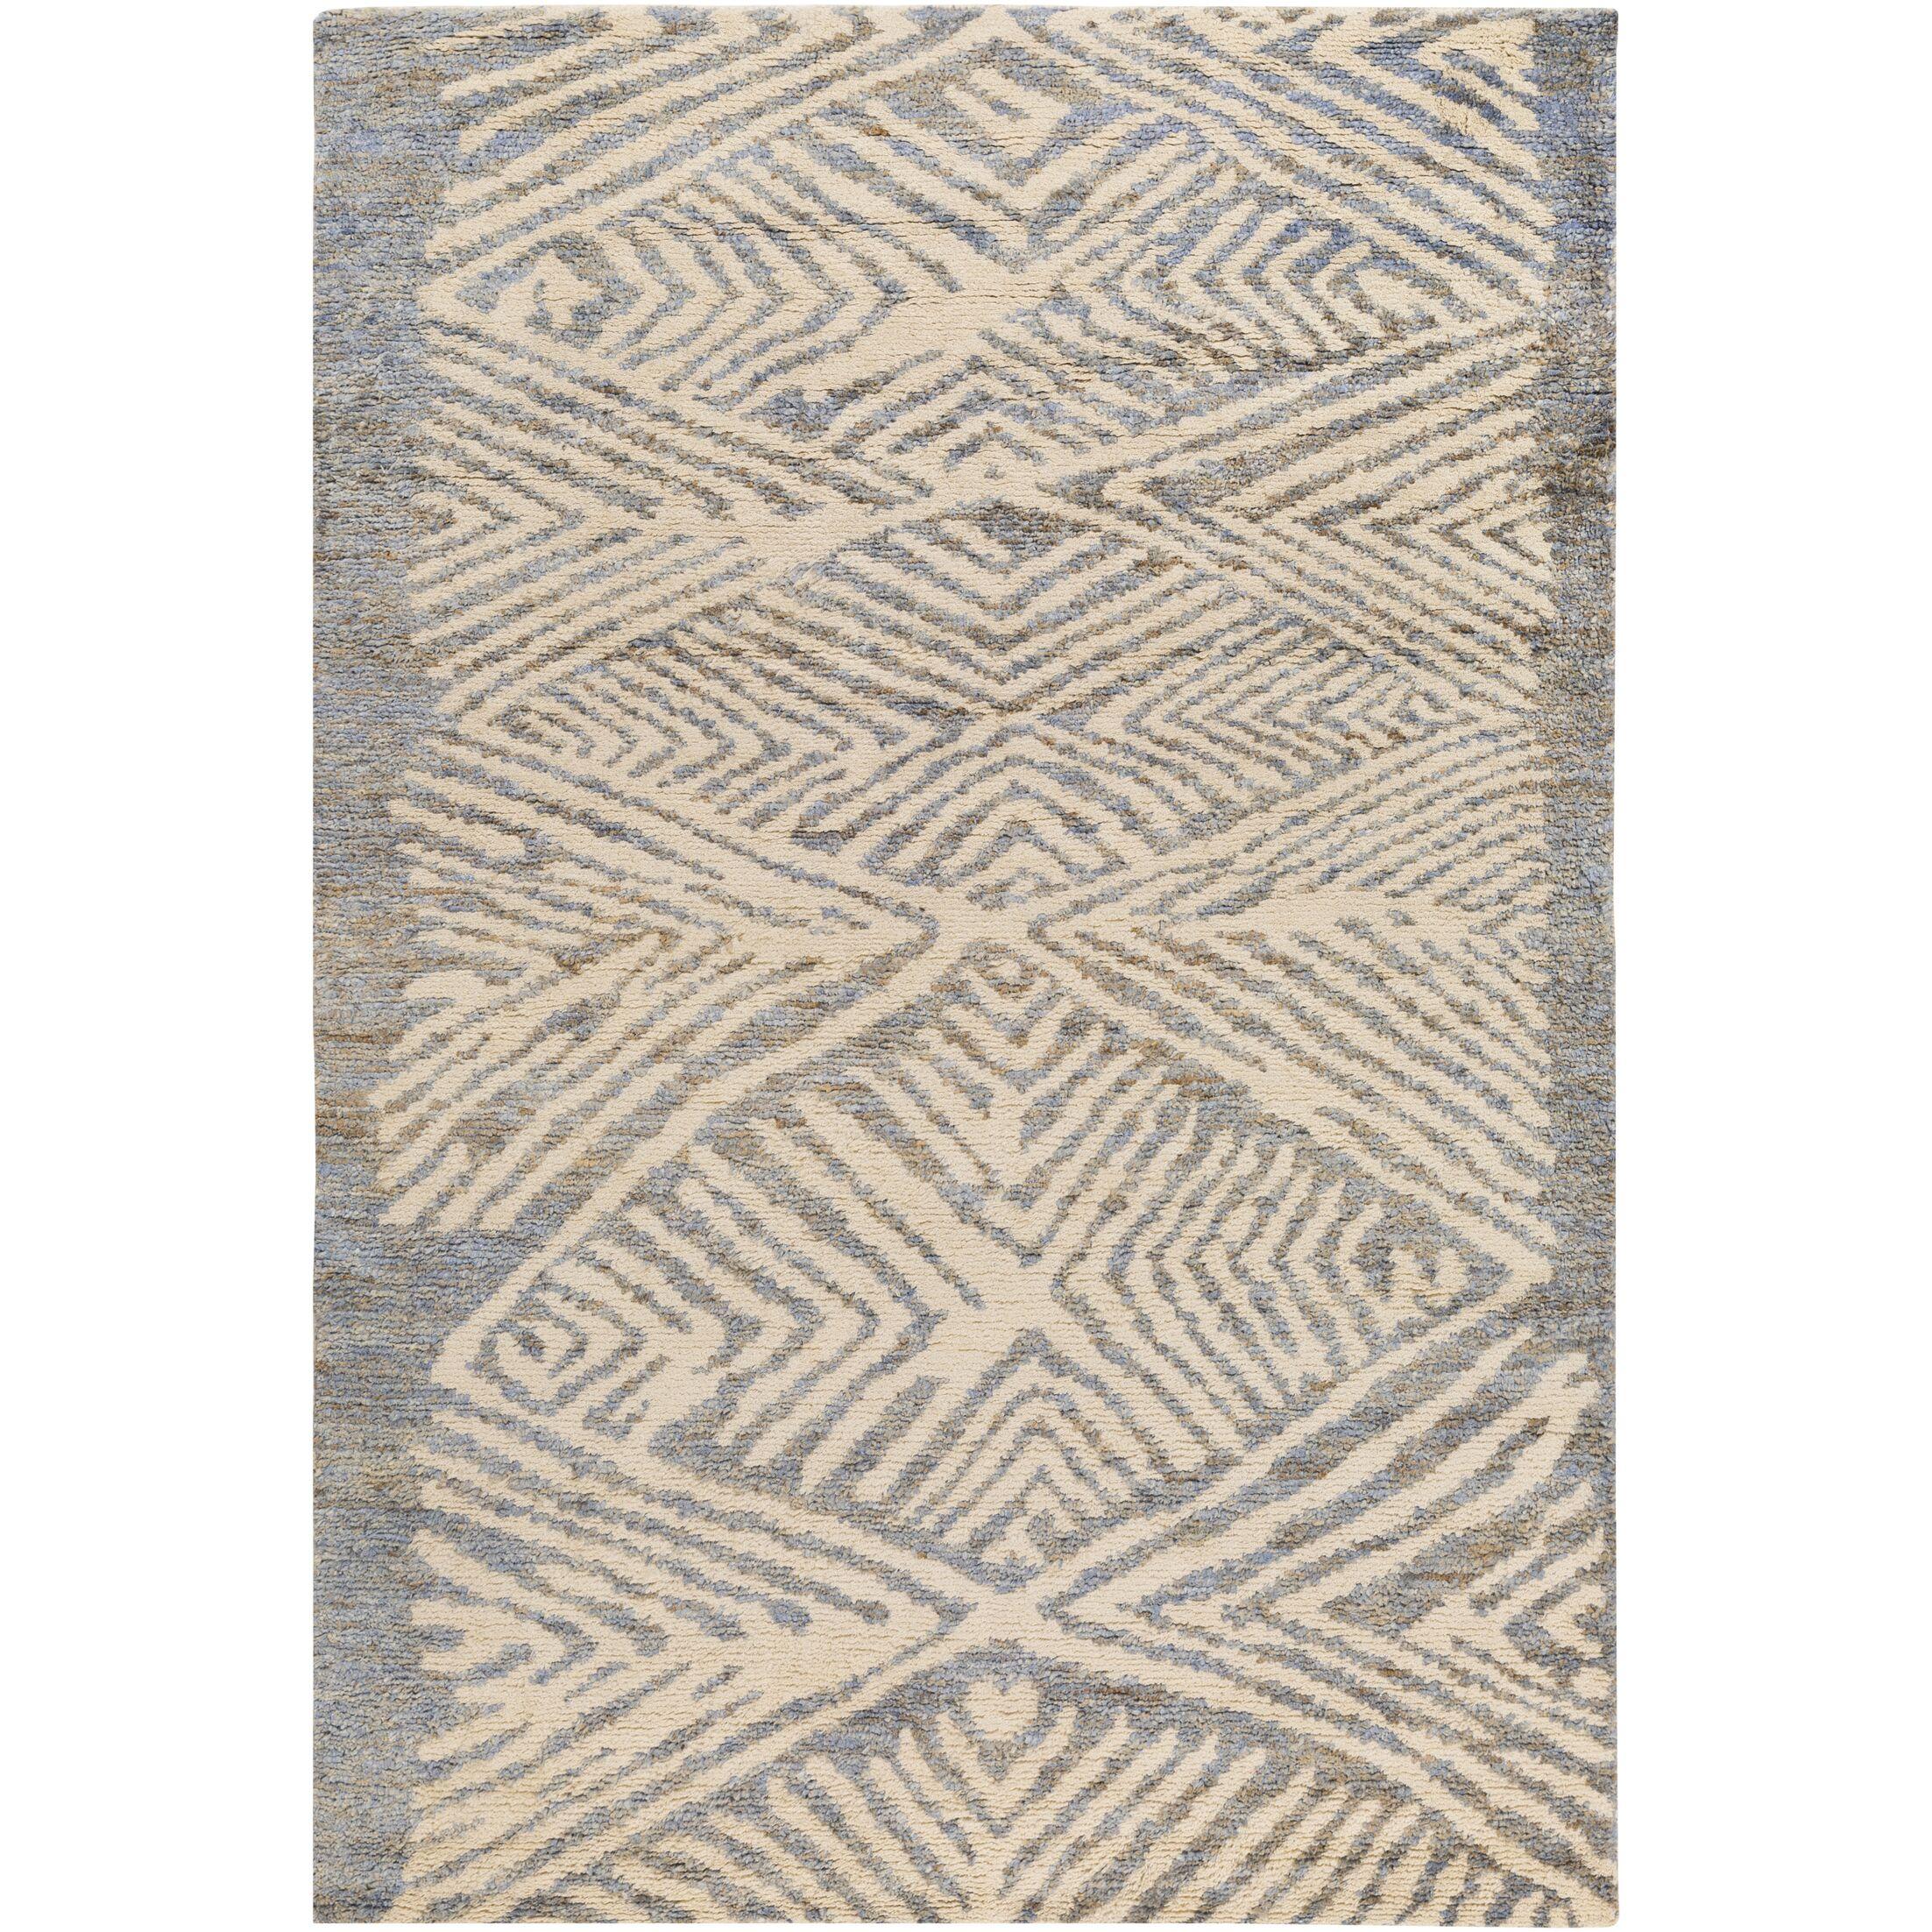 Orinocco Hand-Woven Gray/Beige Area Rug Rug Size: Rectangle 5' x 7'6